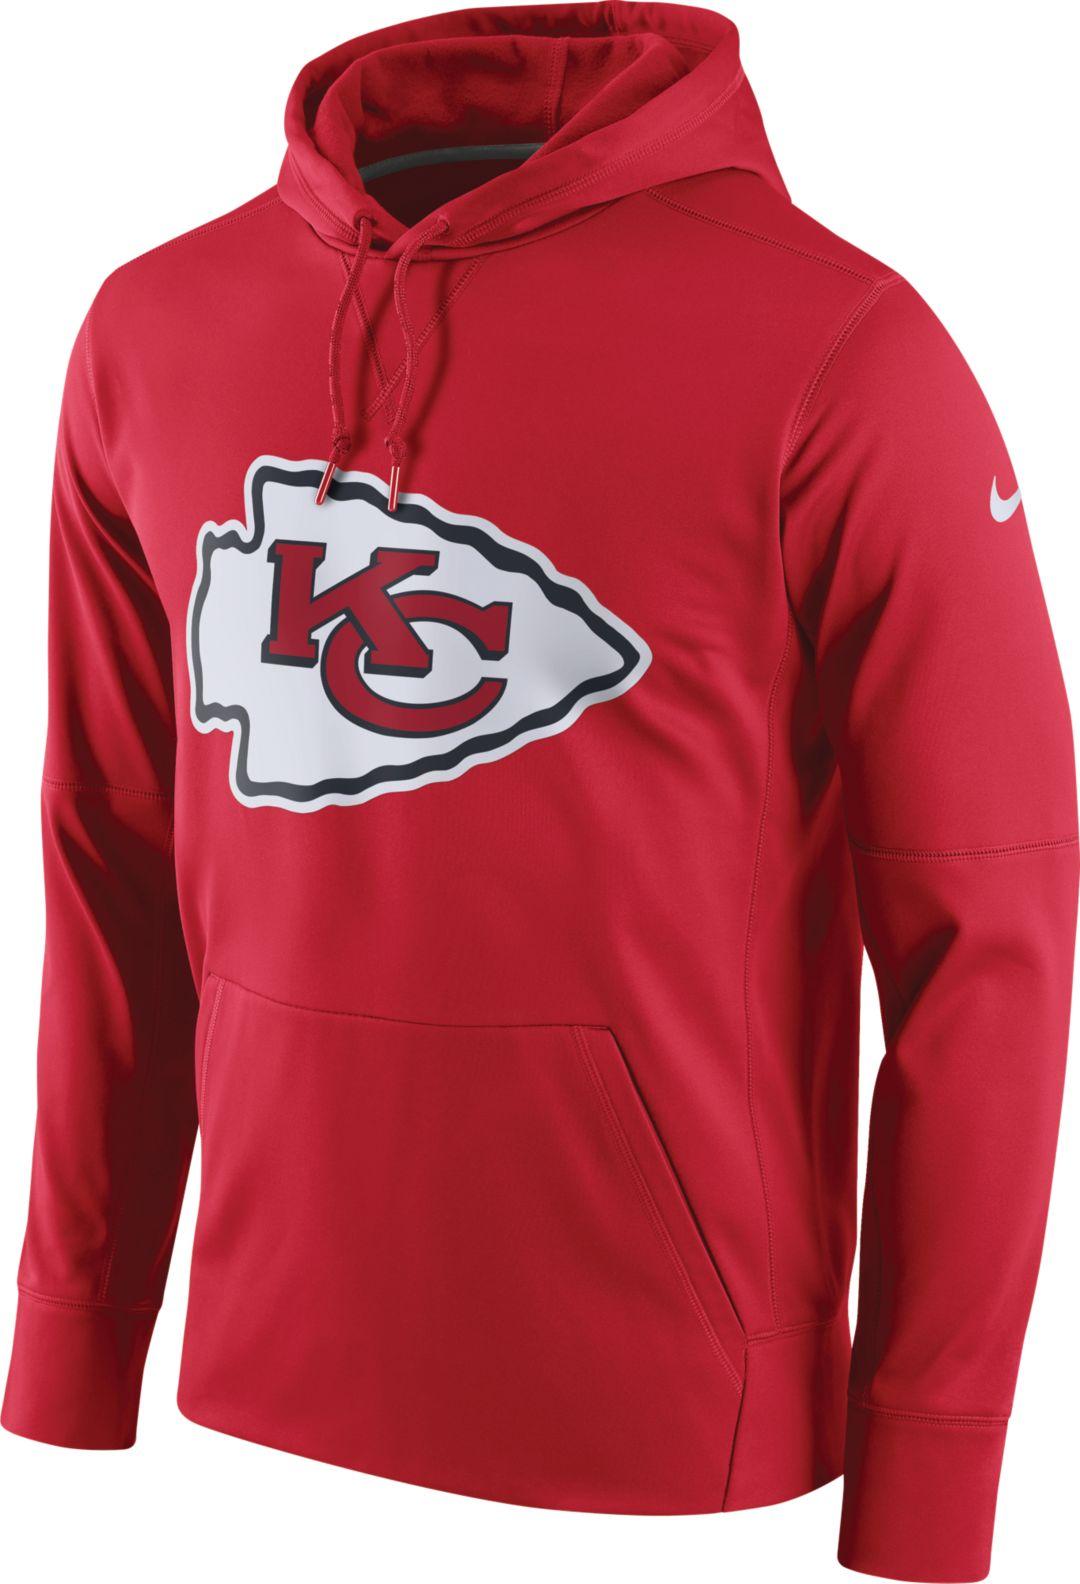 313ed2af8e38 Nike Men s Kansas City Chiefs Performance Circuit Logo Essential Red Hoodie  1